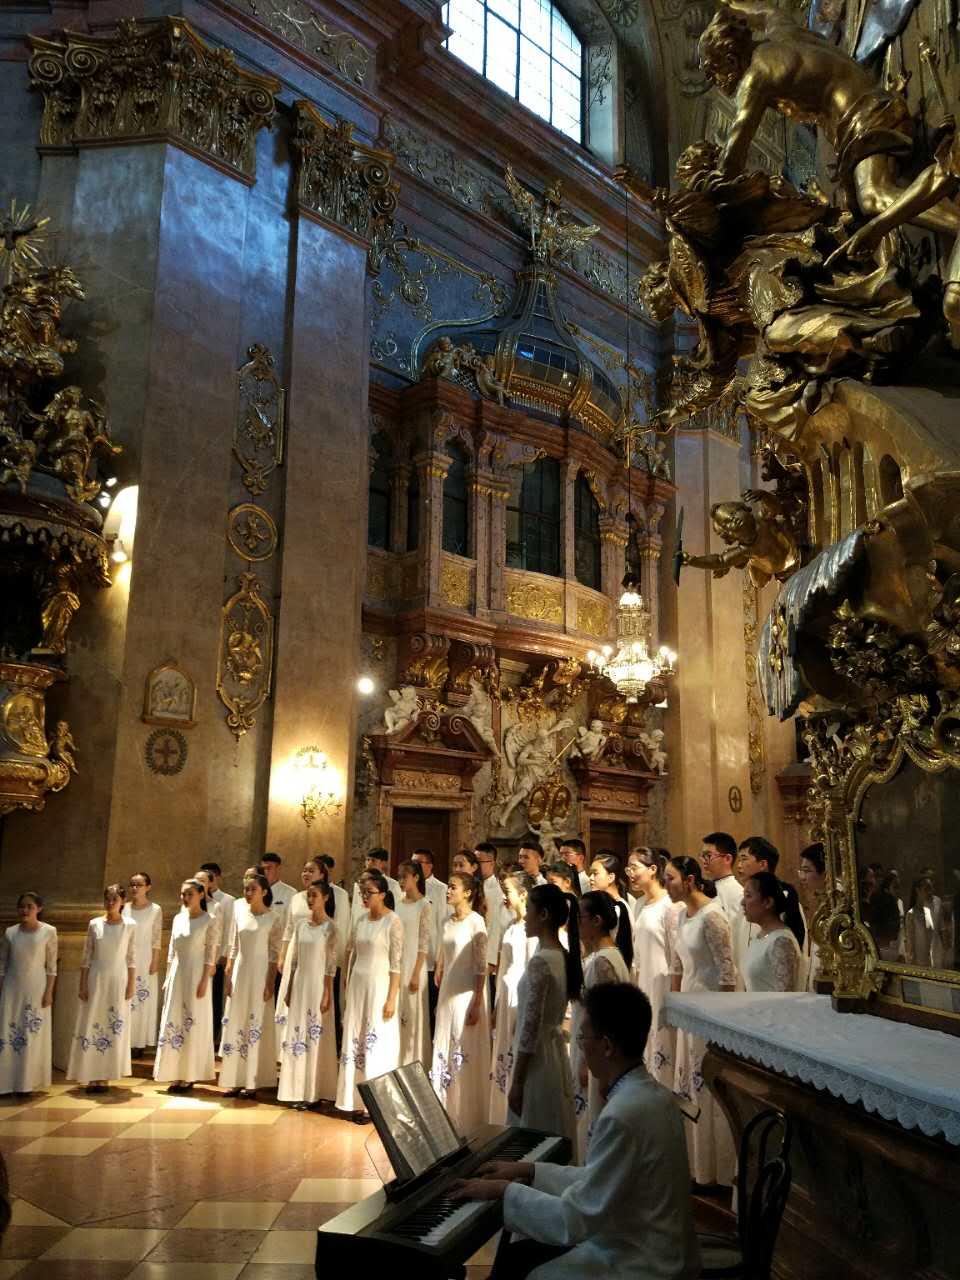 World Peace Choral Festival, Eröffnungskonzert im Petersdom